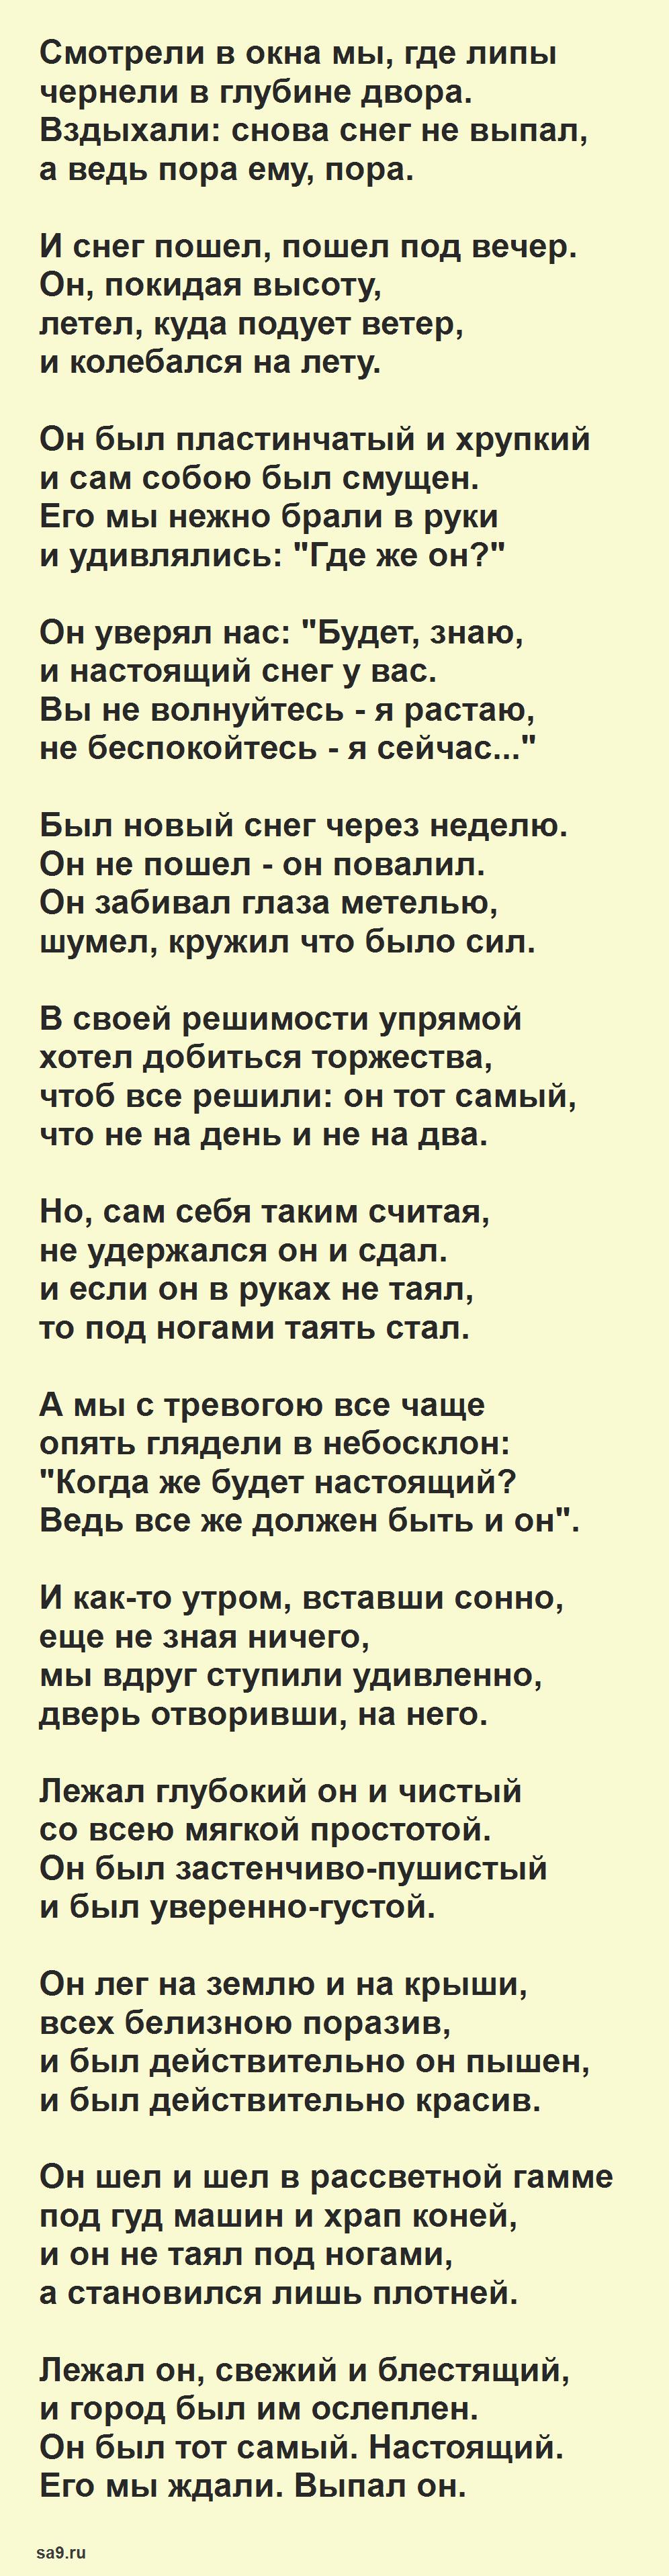 Стихи Евтушенко - Третий снег